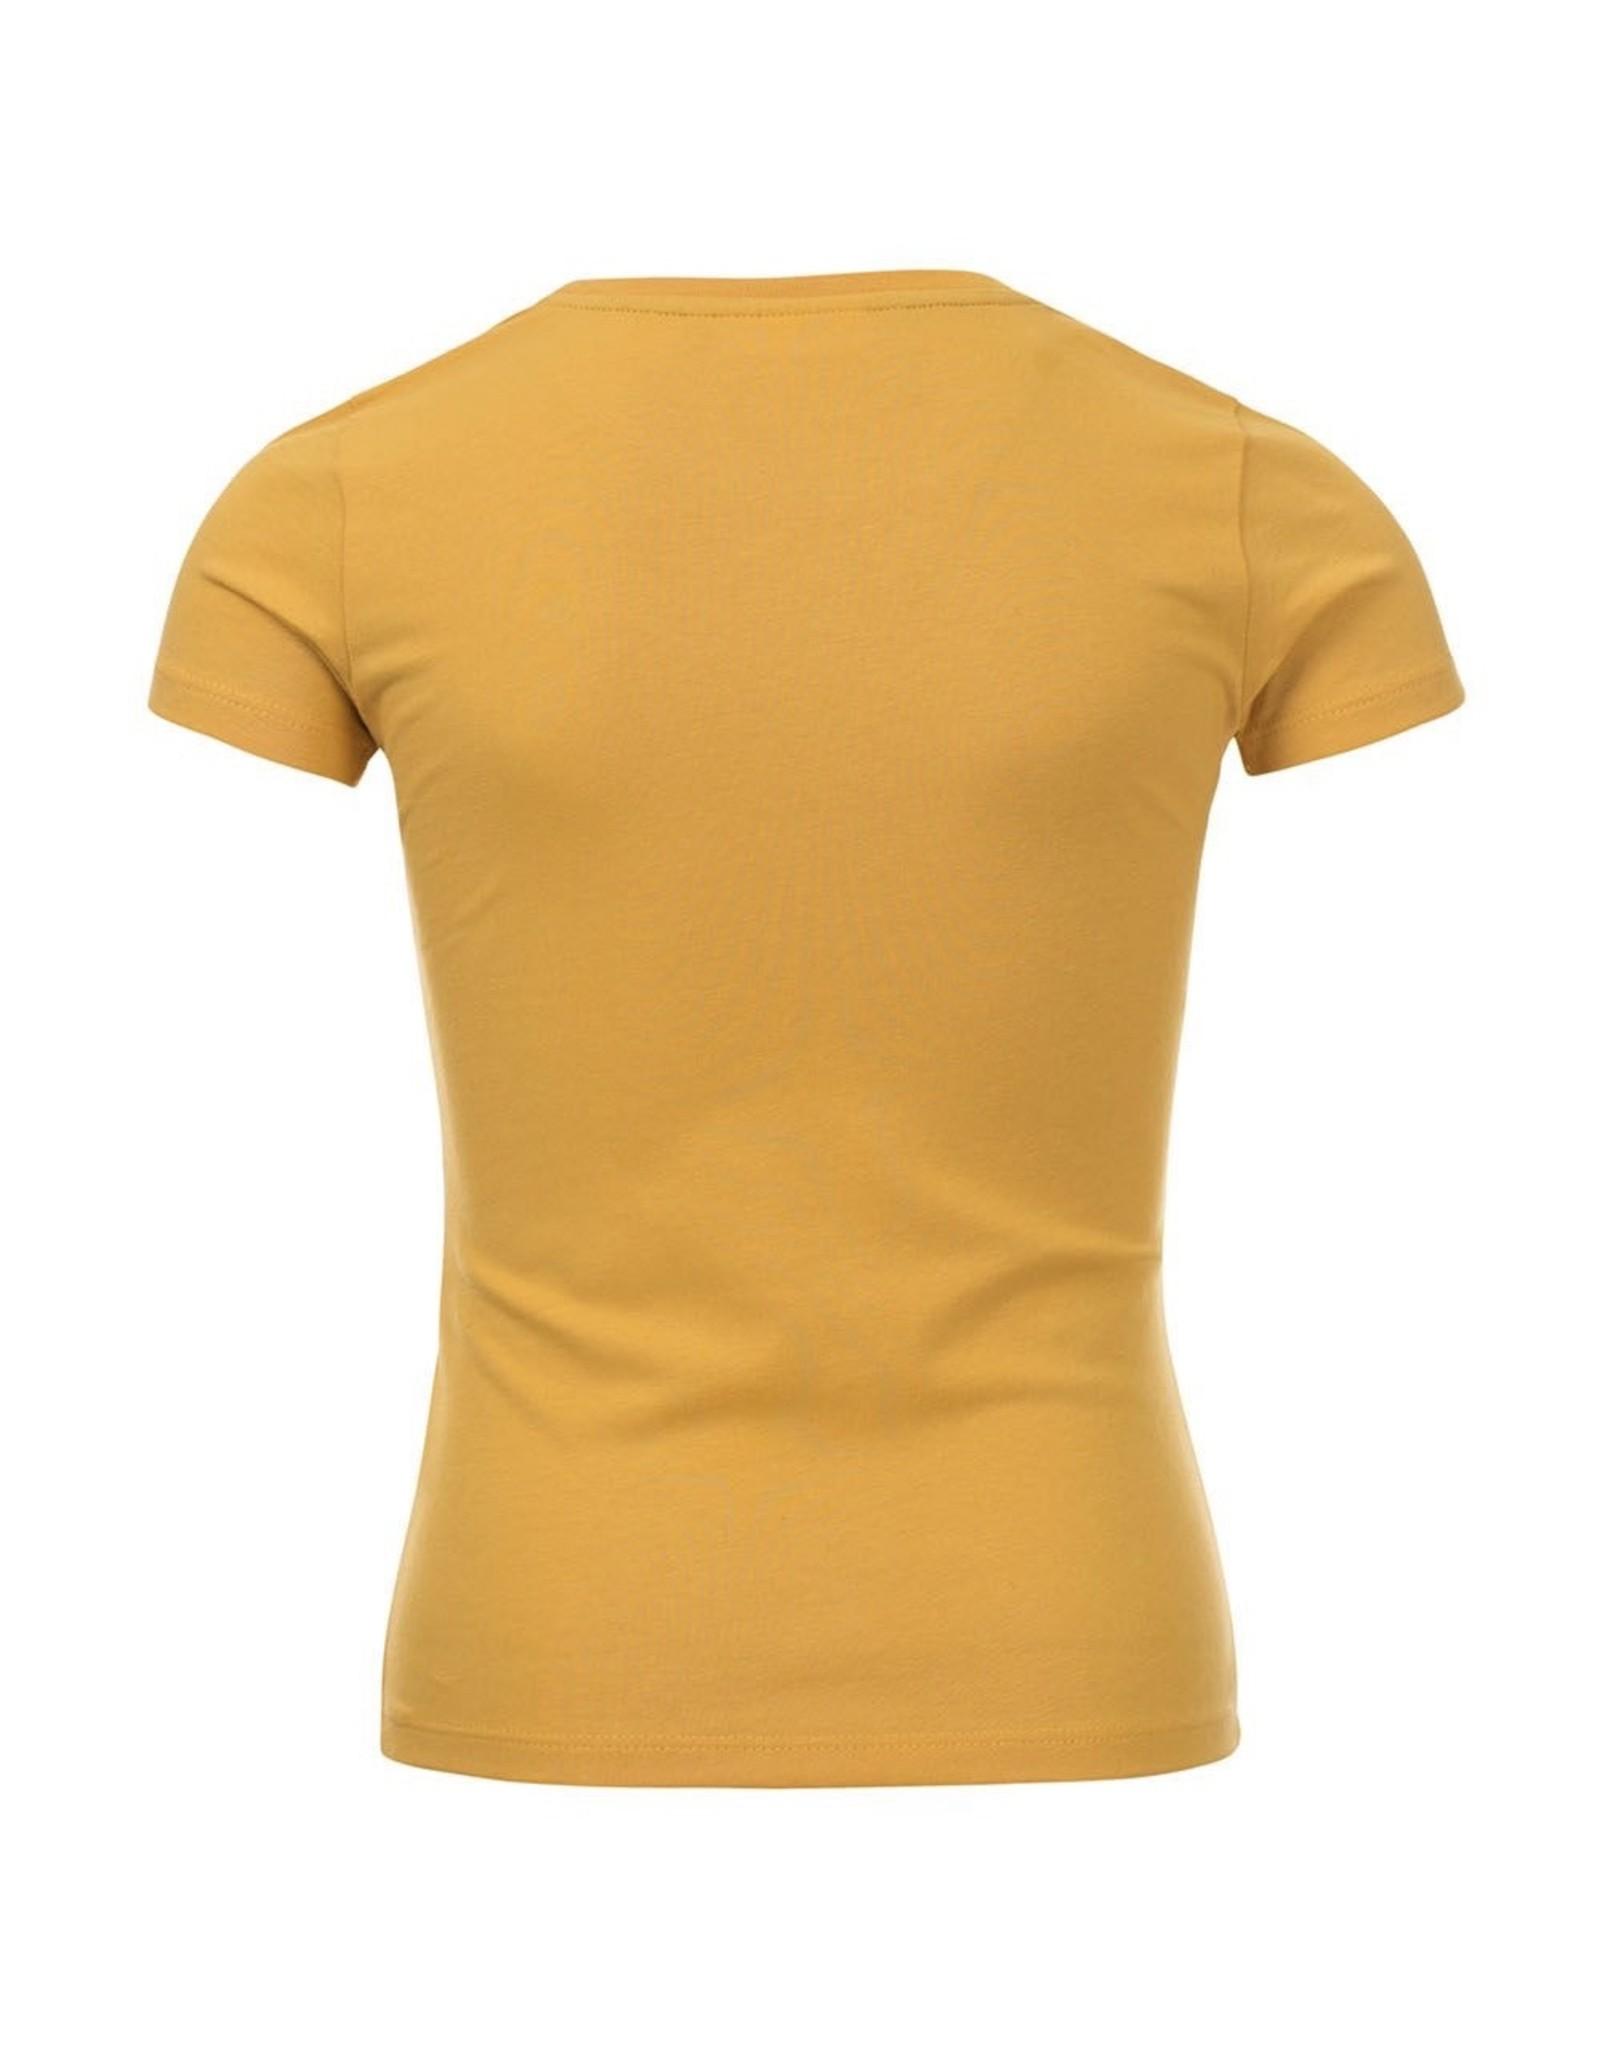 looxs 2131-5421 T-Shirt